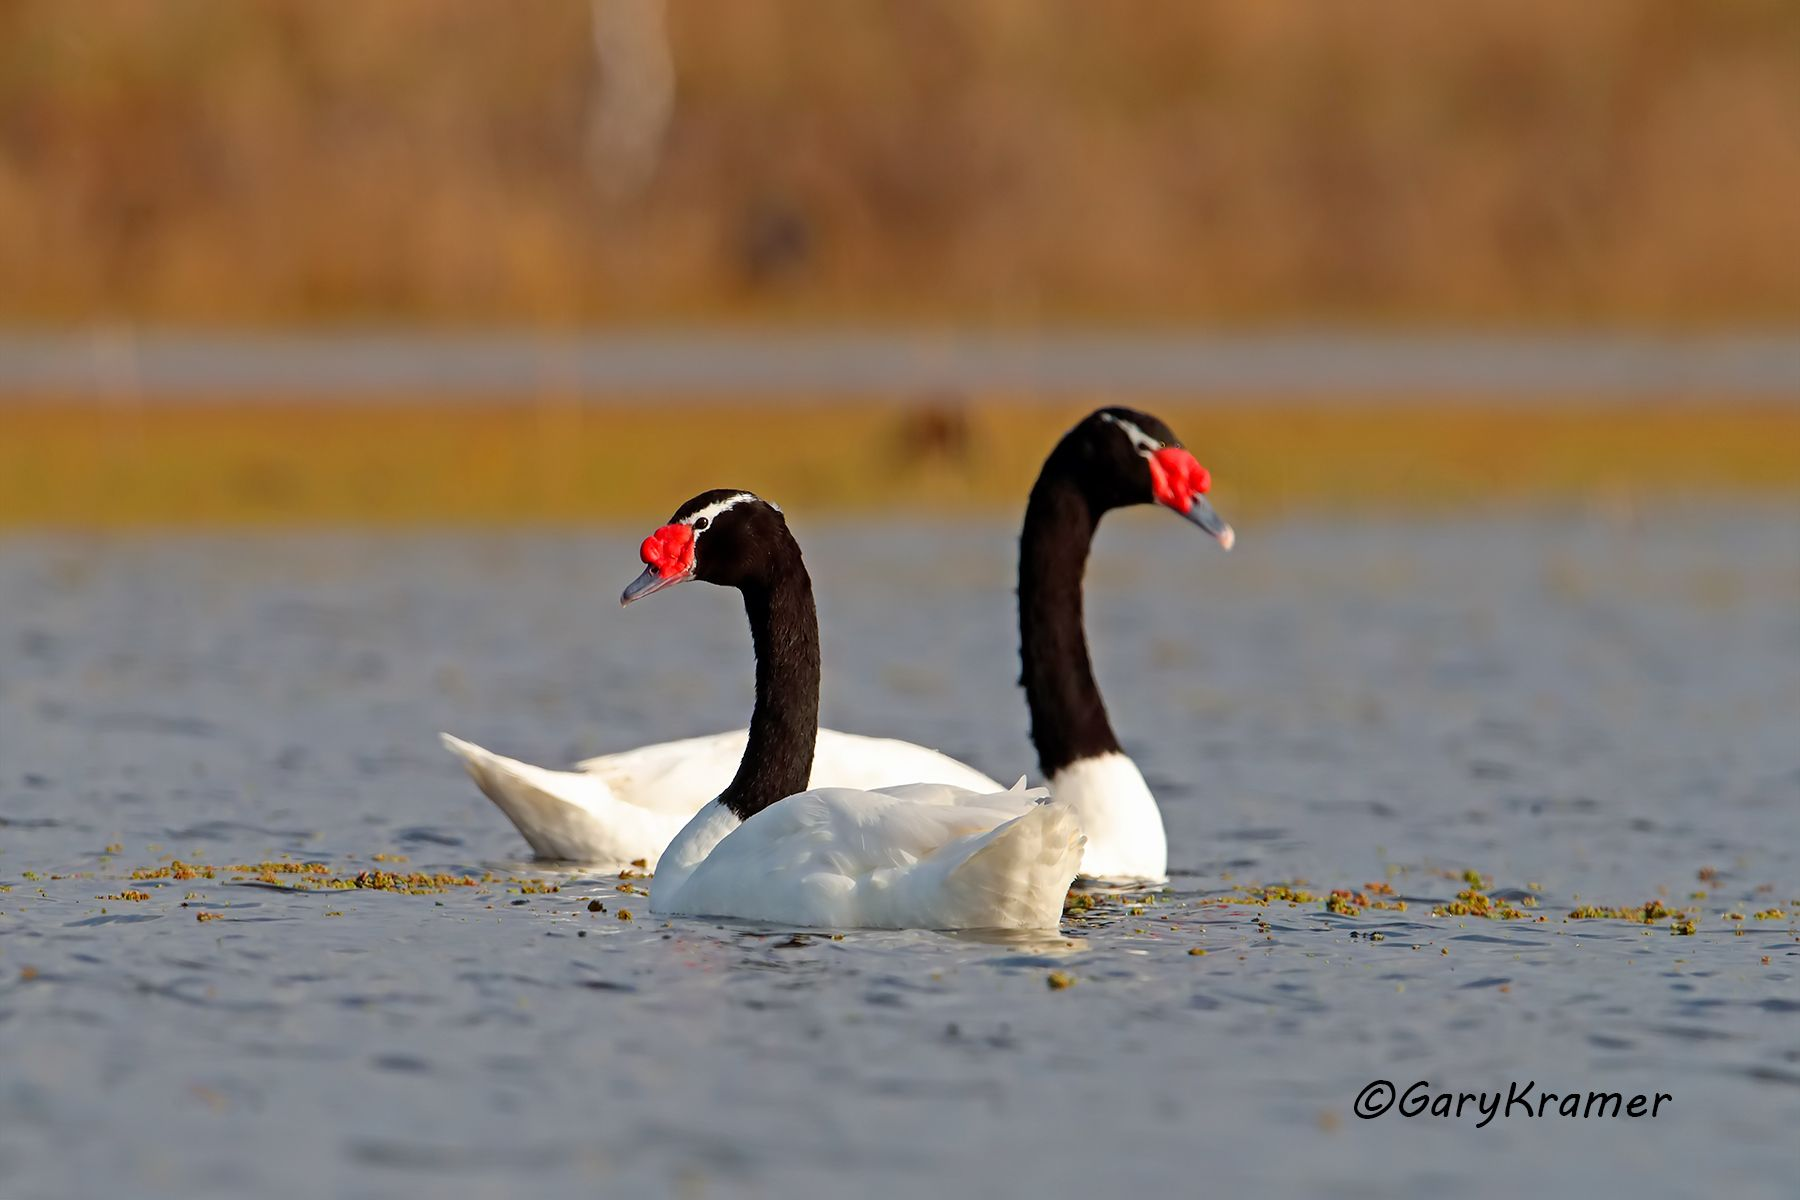 Black-necked Swan (Cygnus melanocoryphus) Argentina - SBWSb#079d